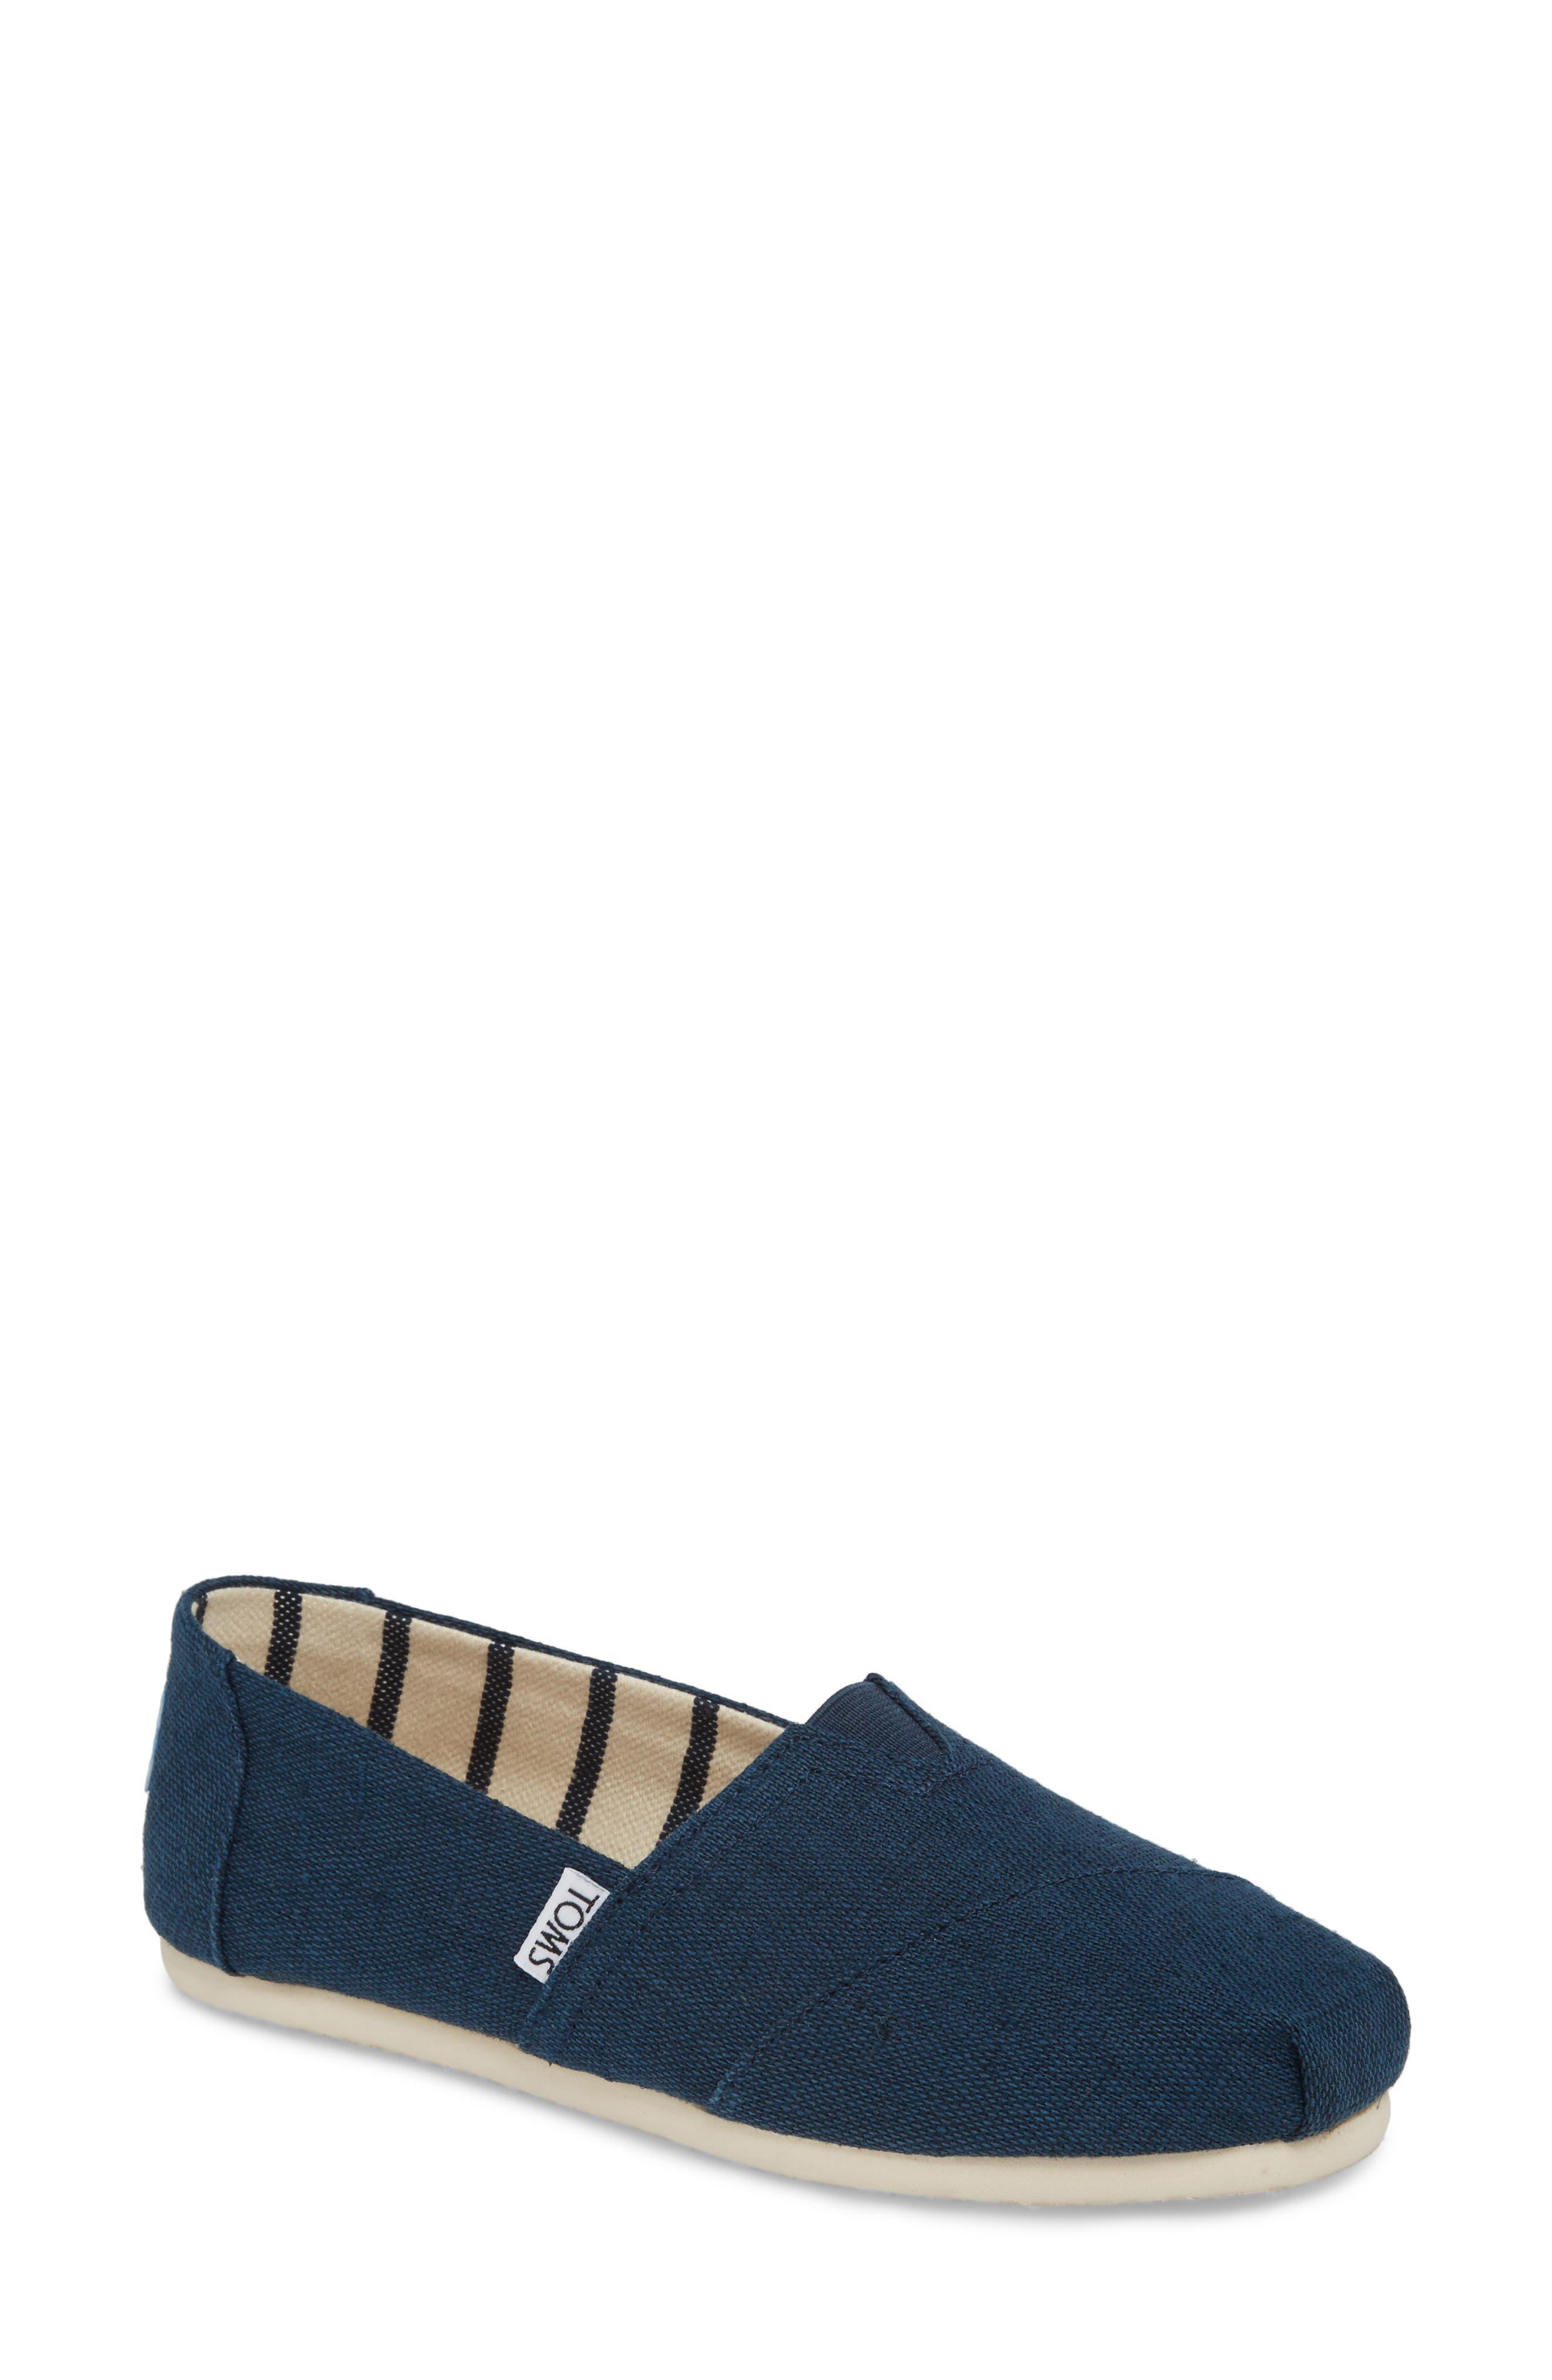 Online 59WEYBBW Women Best Cheap Toms Unisex All Darkblue Classic Canvas Shoes